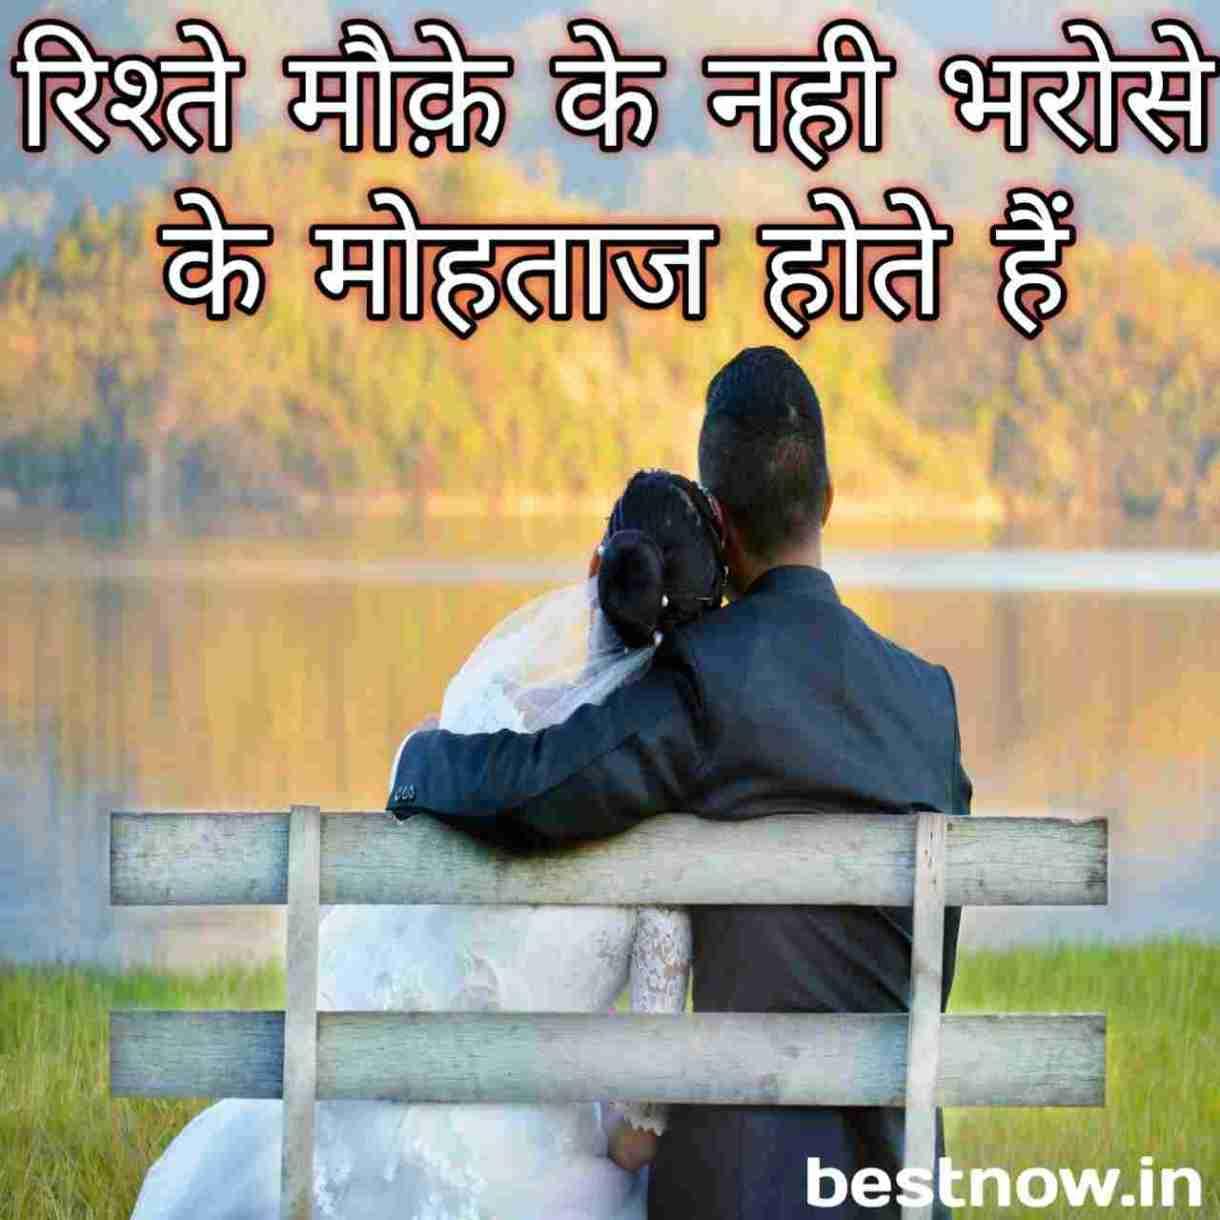 Hindi suvichar on life